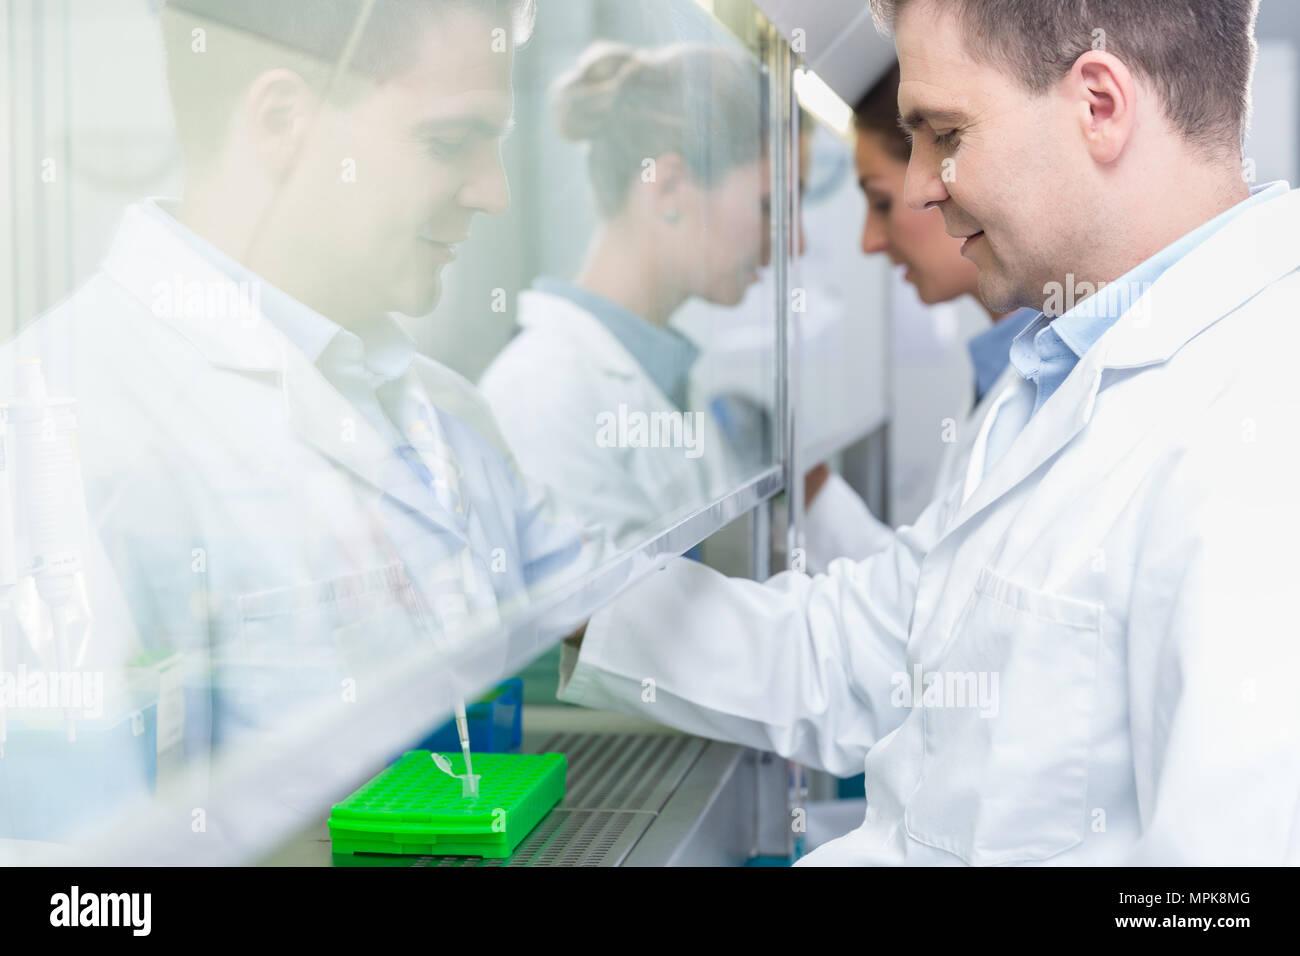 Researchers in science lab preparing samples  - Stock Image